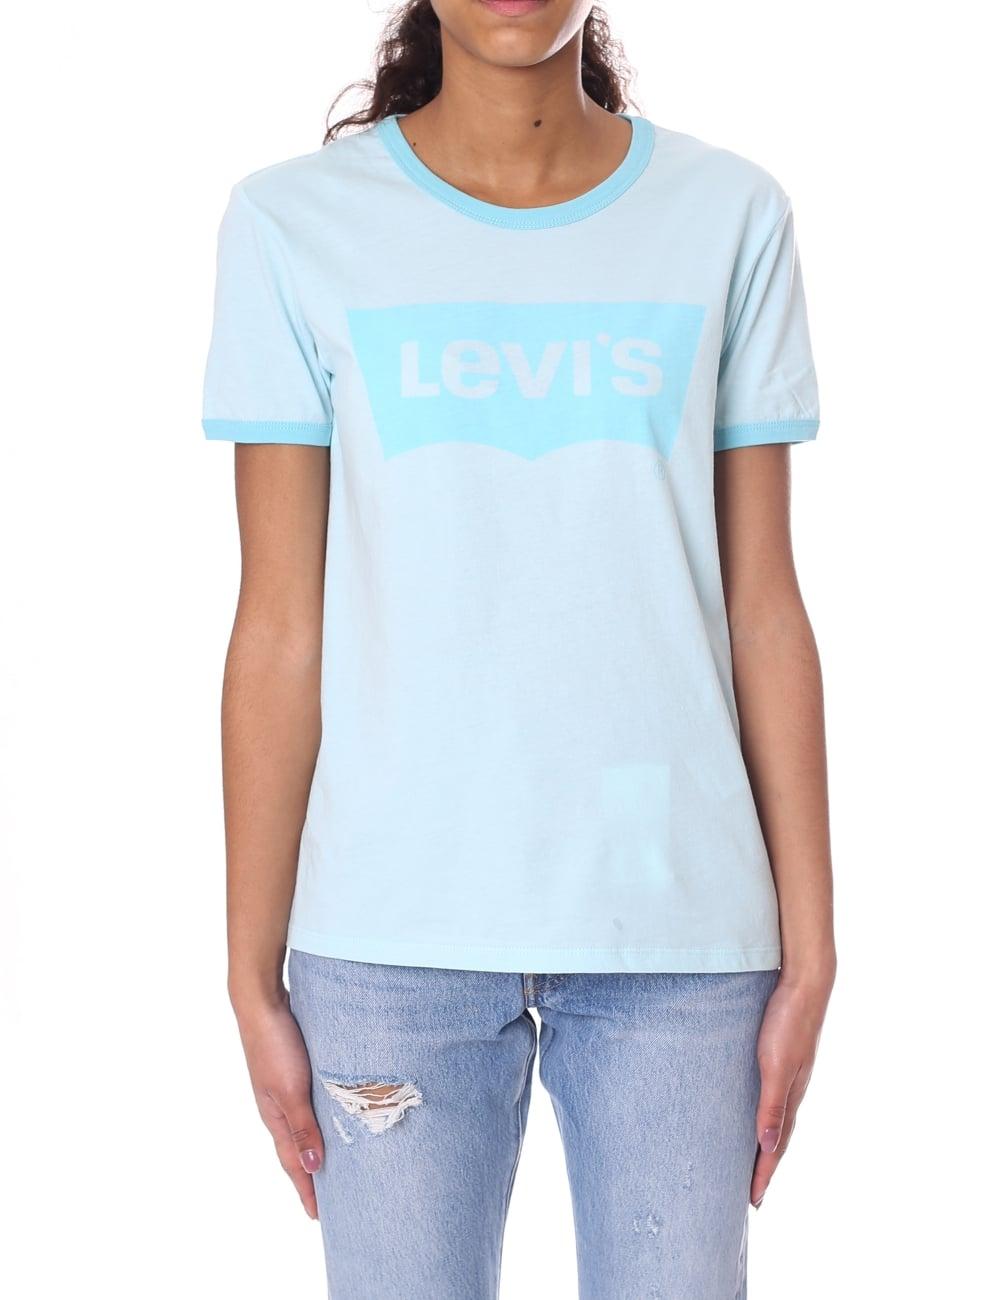 Levis Perfect Ringer Womens Crew Neck Tee